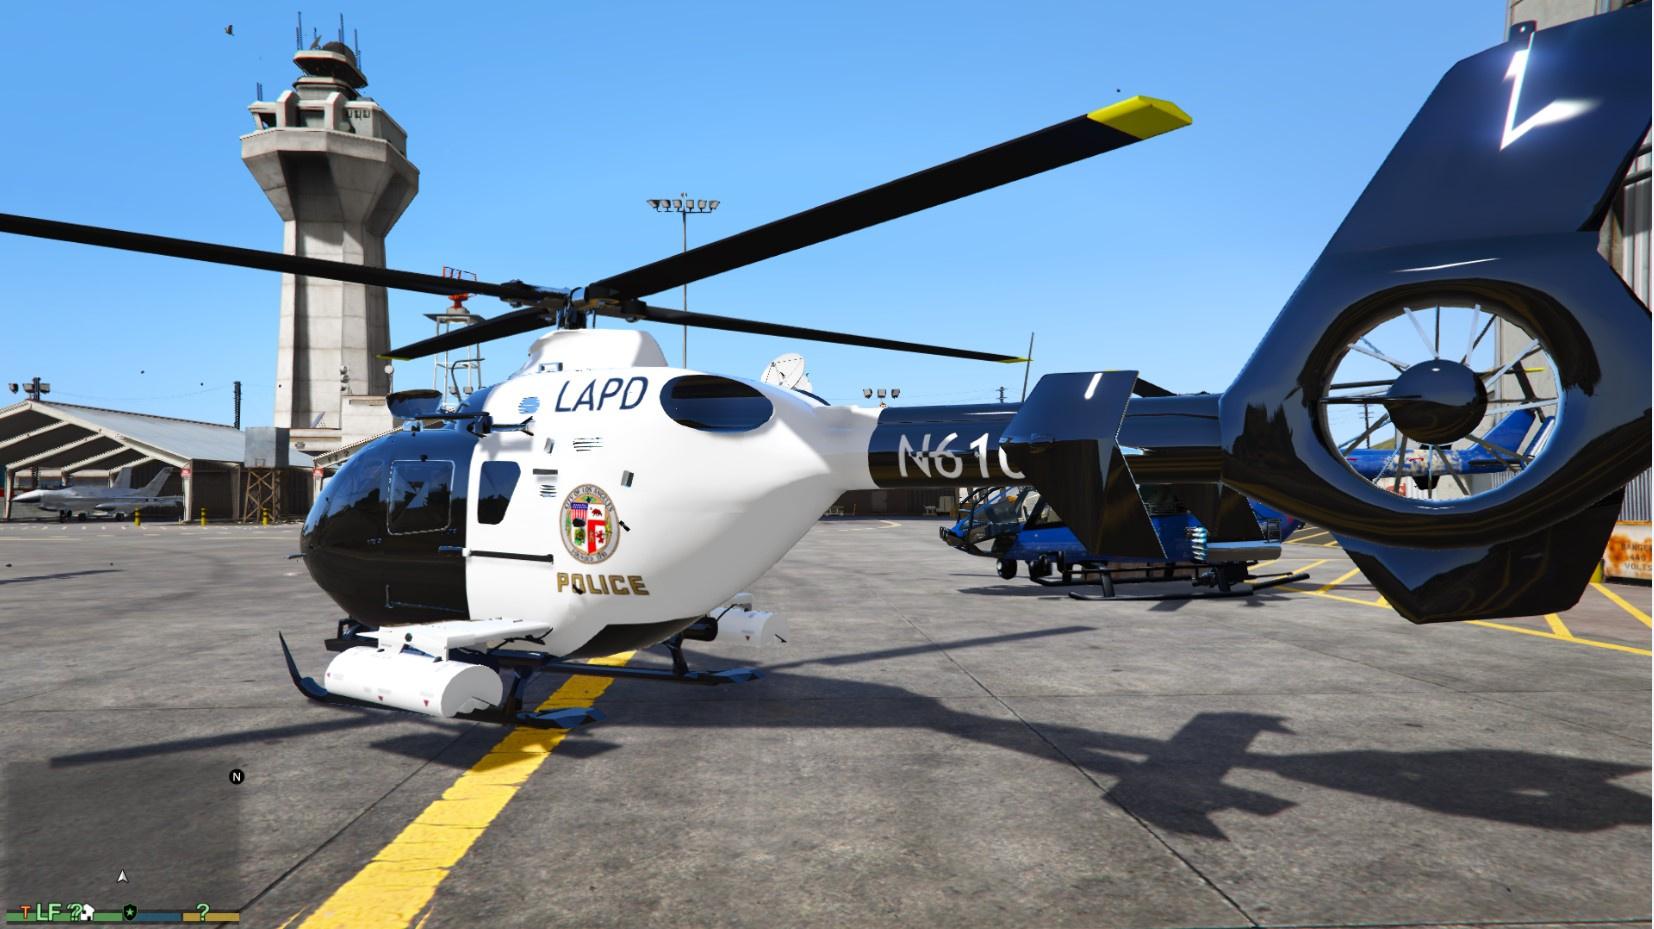 Eurocopter Ec 135 Lapd Version Gta5 Mods Com